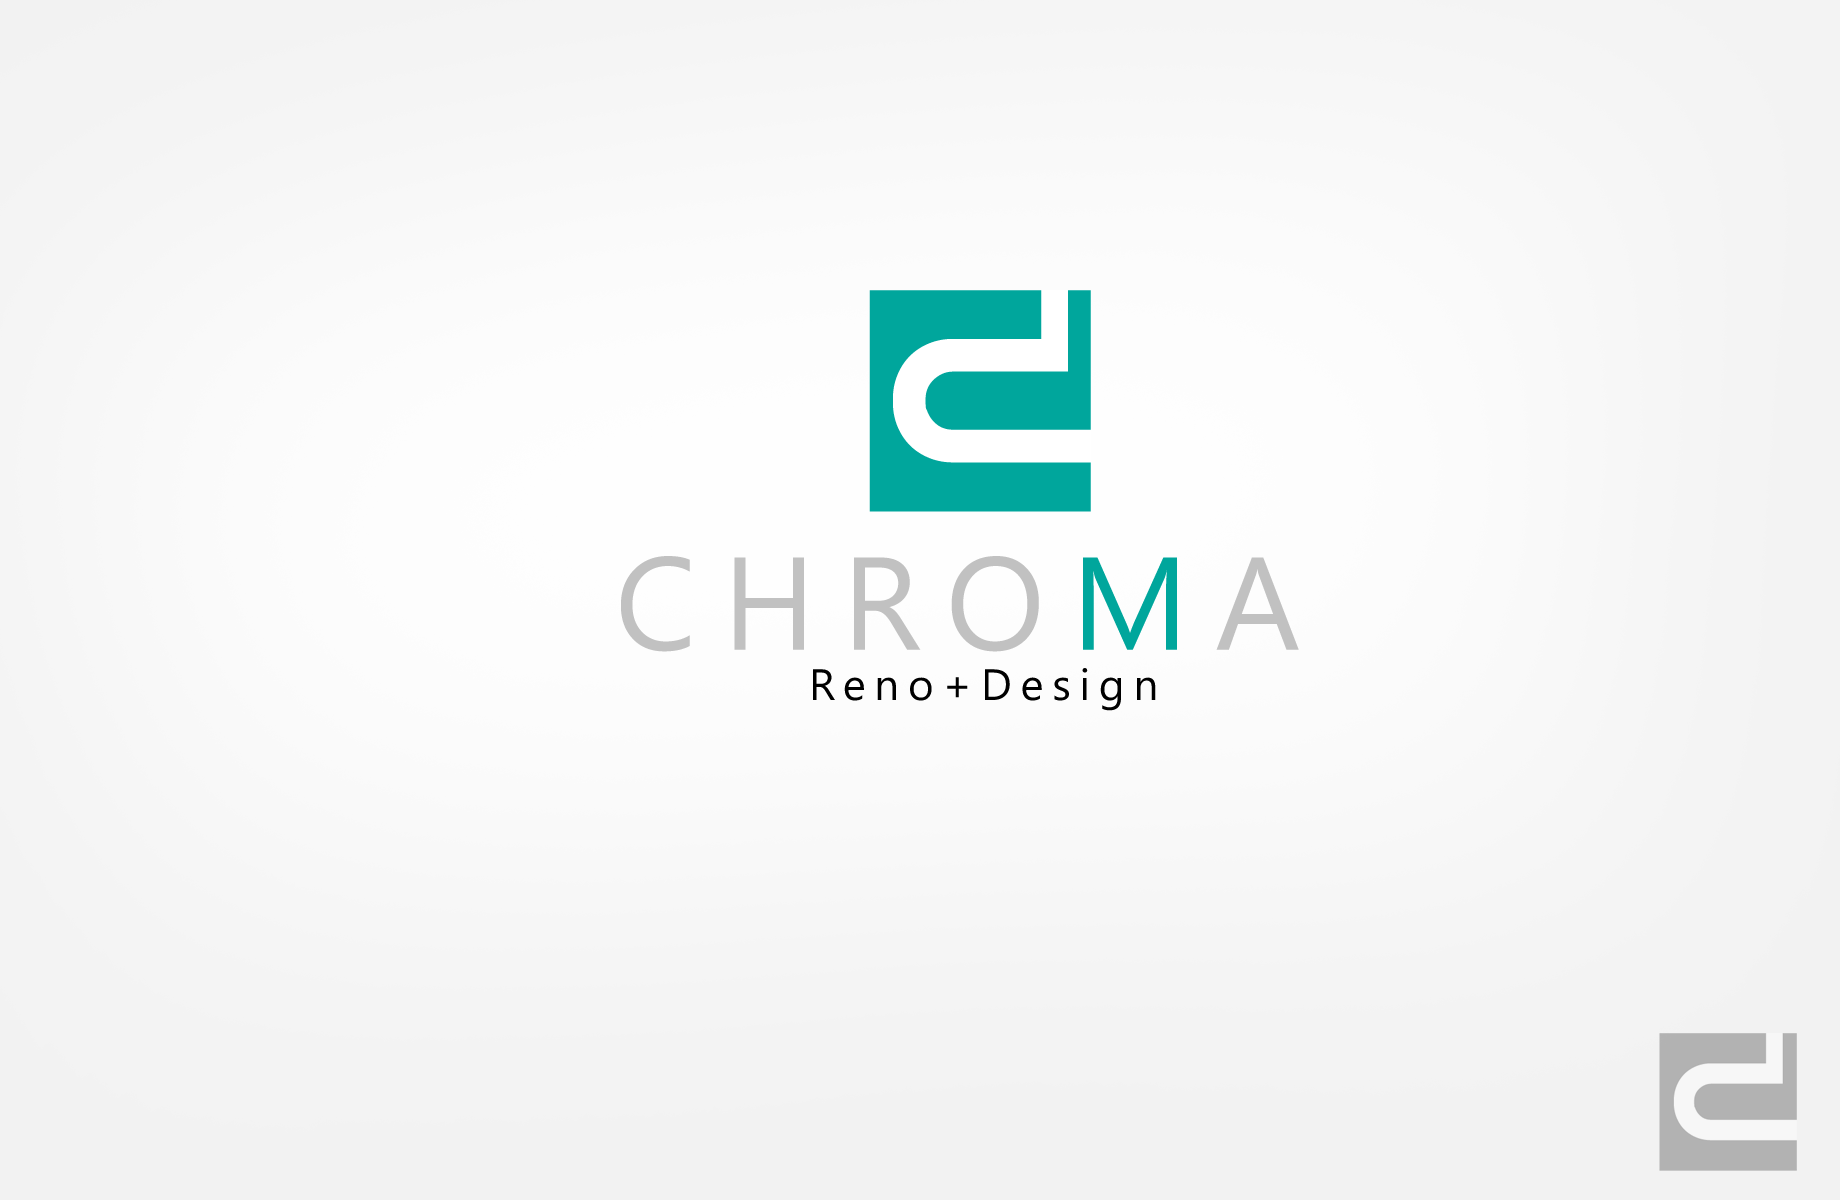 Logo Design by Jan Chua - Entry No. 36 in the Logo Design Contest Inspiring Logo Design for Chroma Reno+Design.